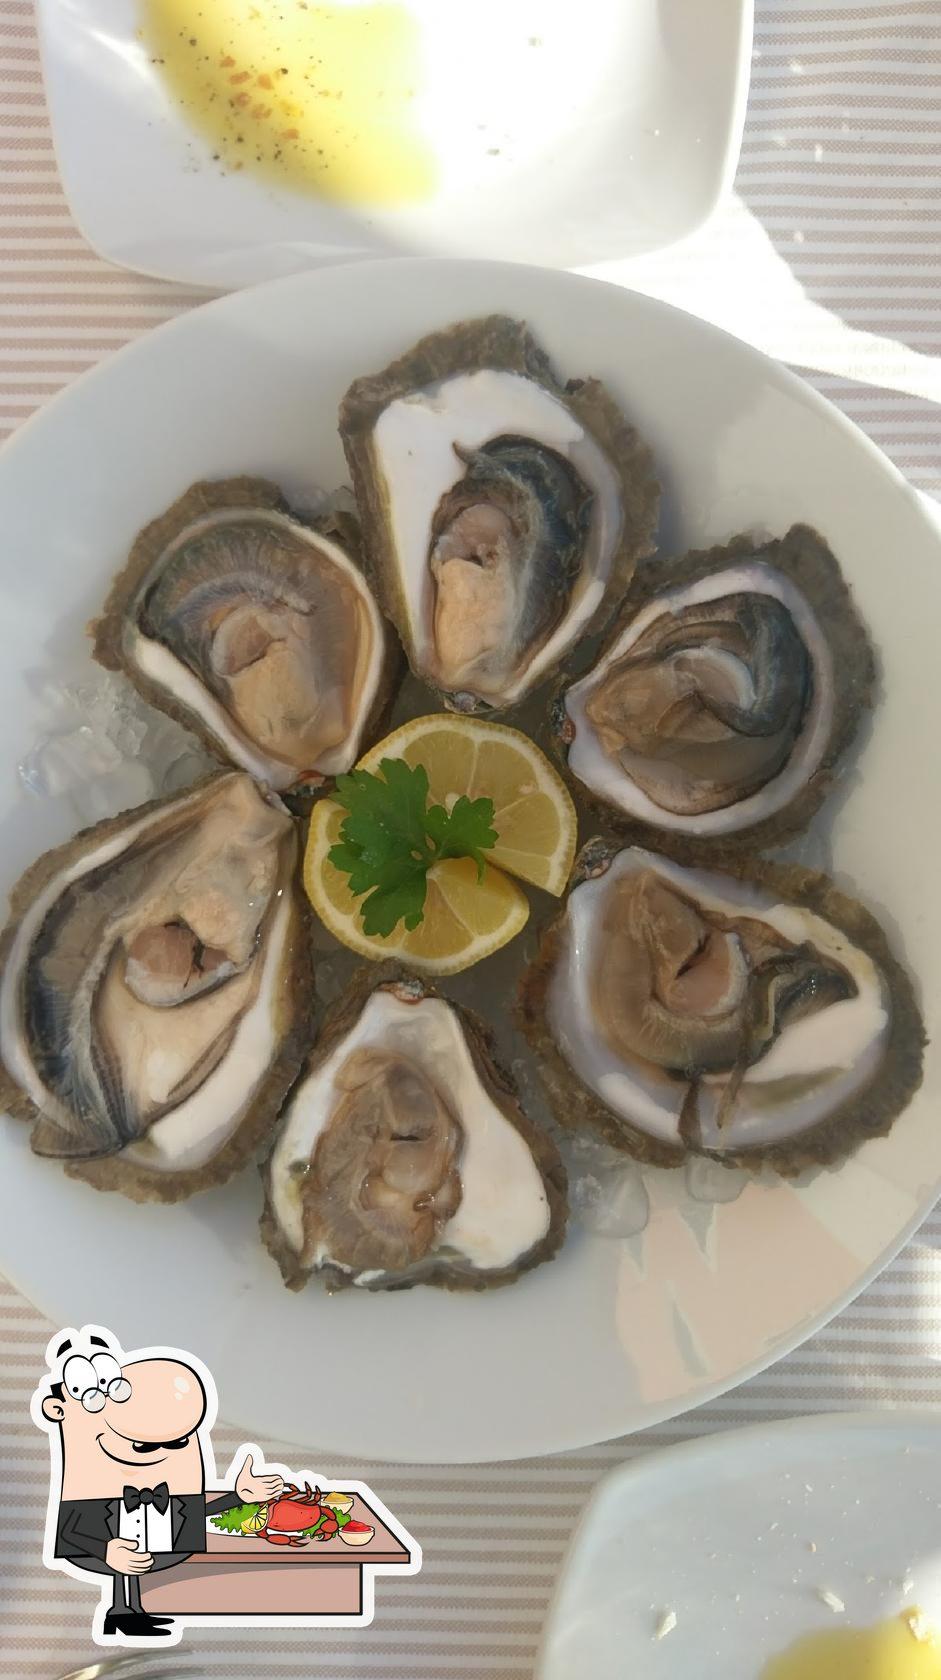 Get seafood at Snack bar Rio